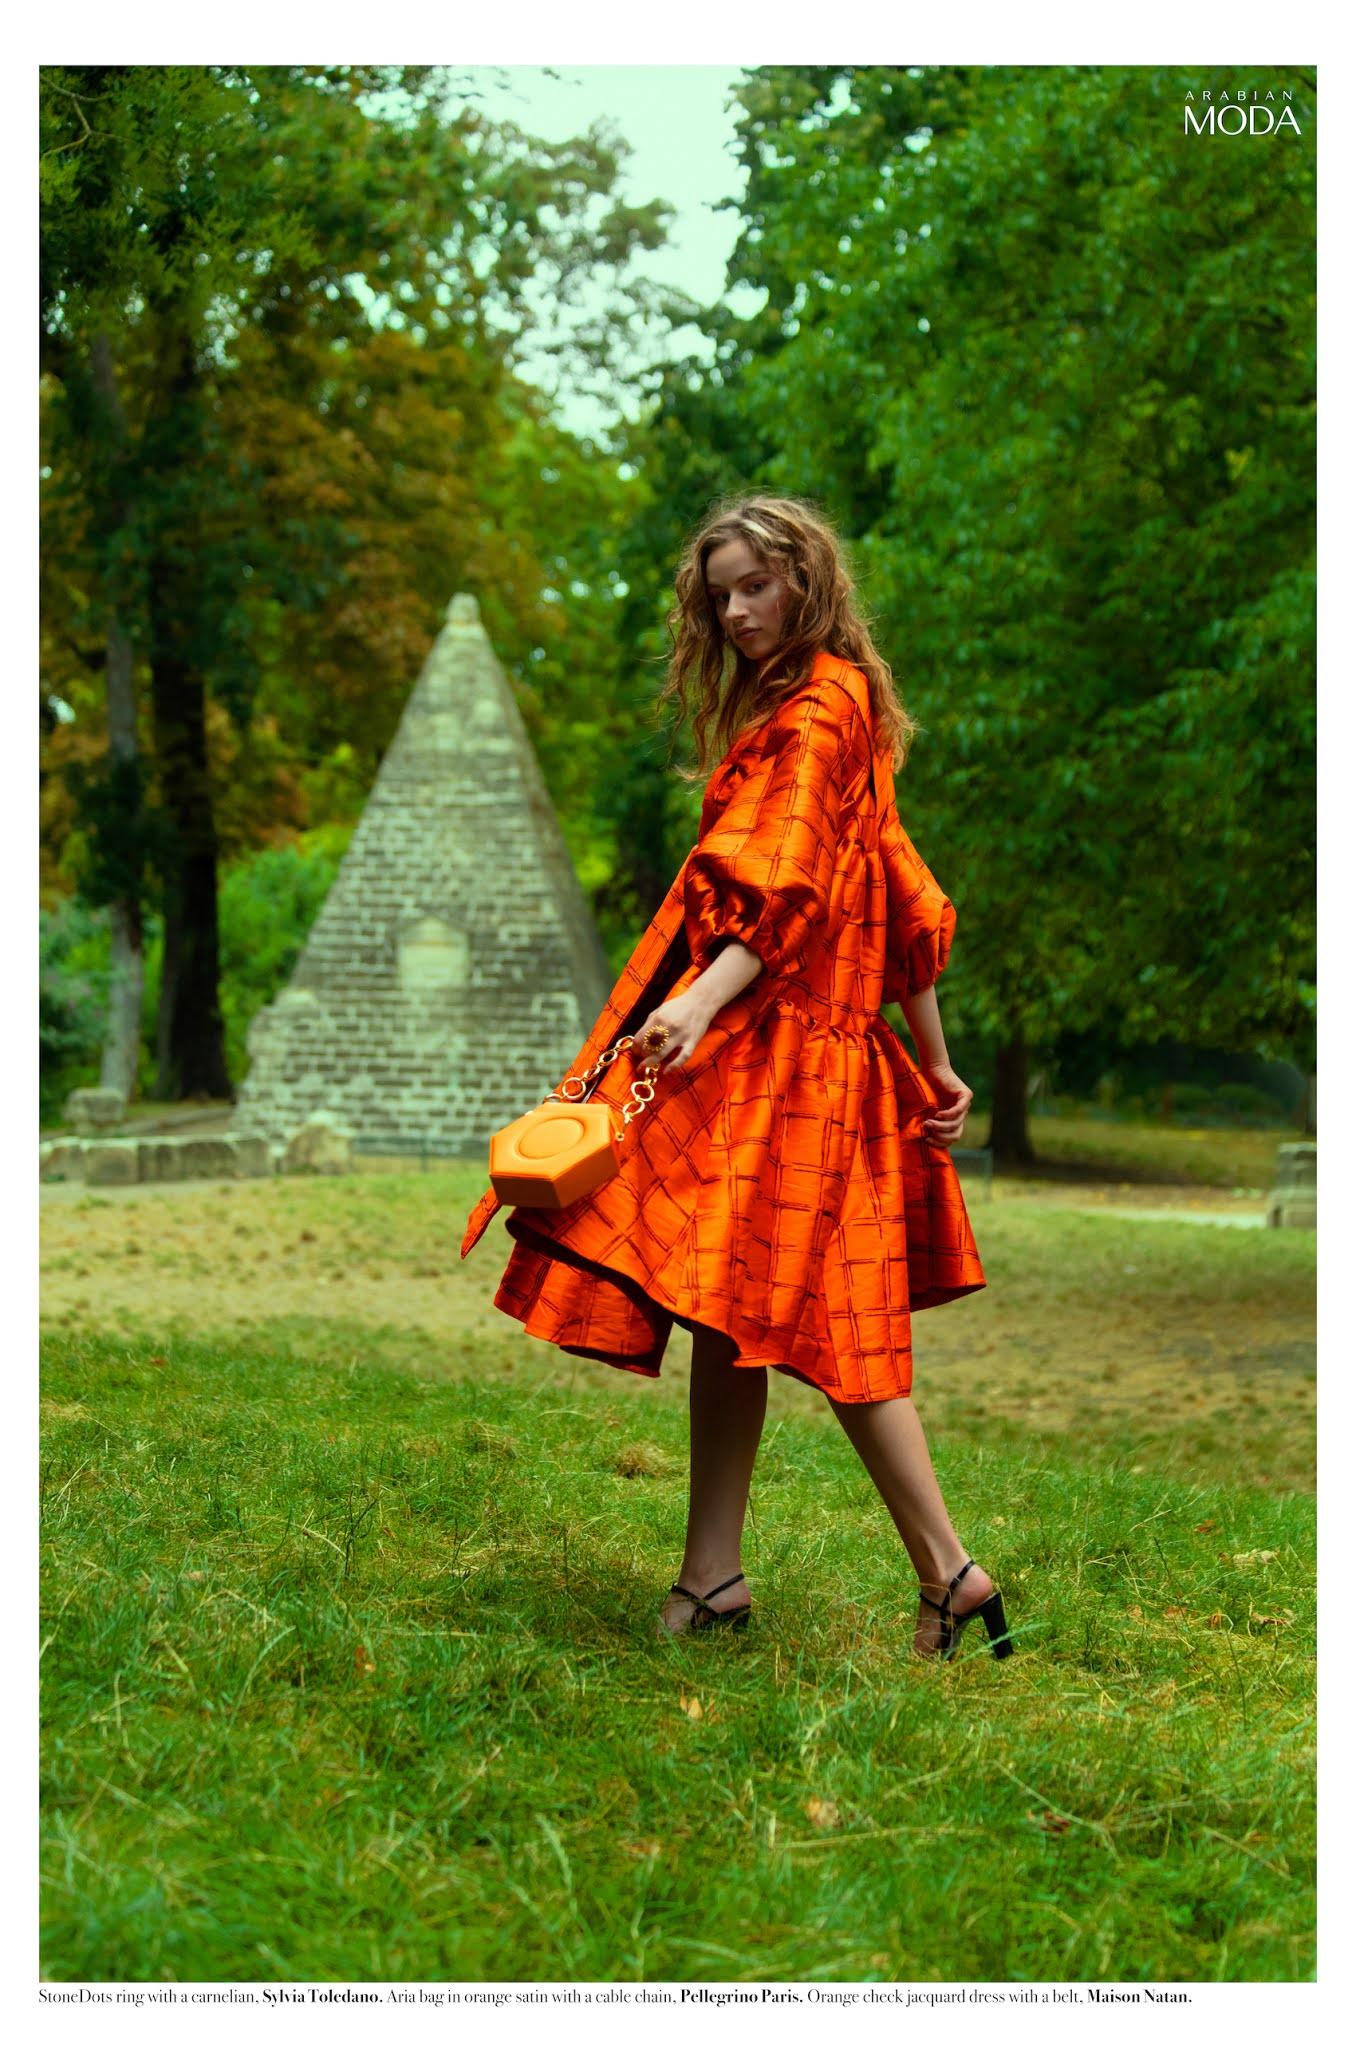 Arabian Moda x Pellegrino Paris x Maison Natan x Sylvia Toledano